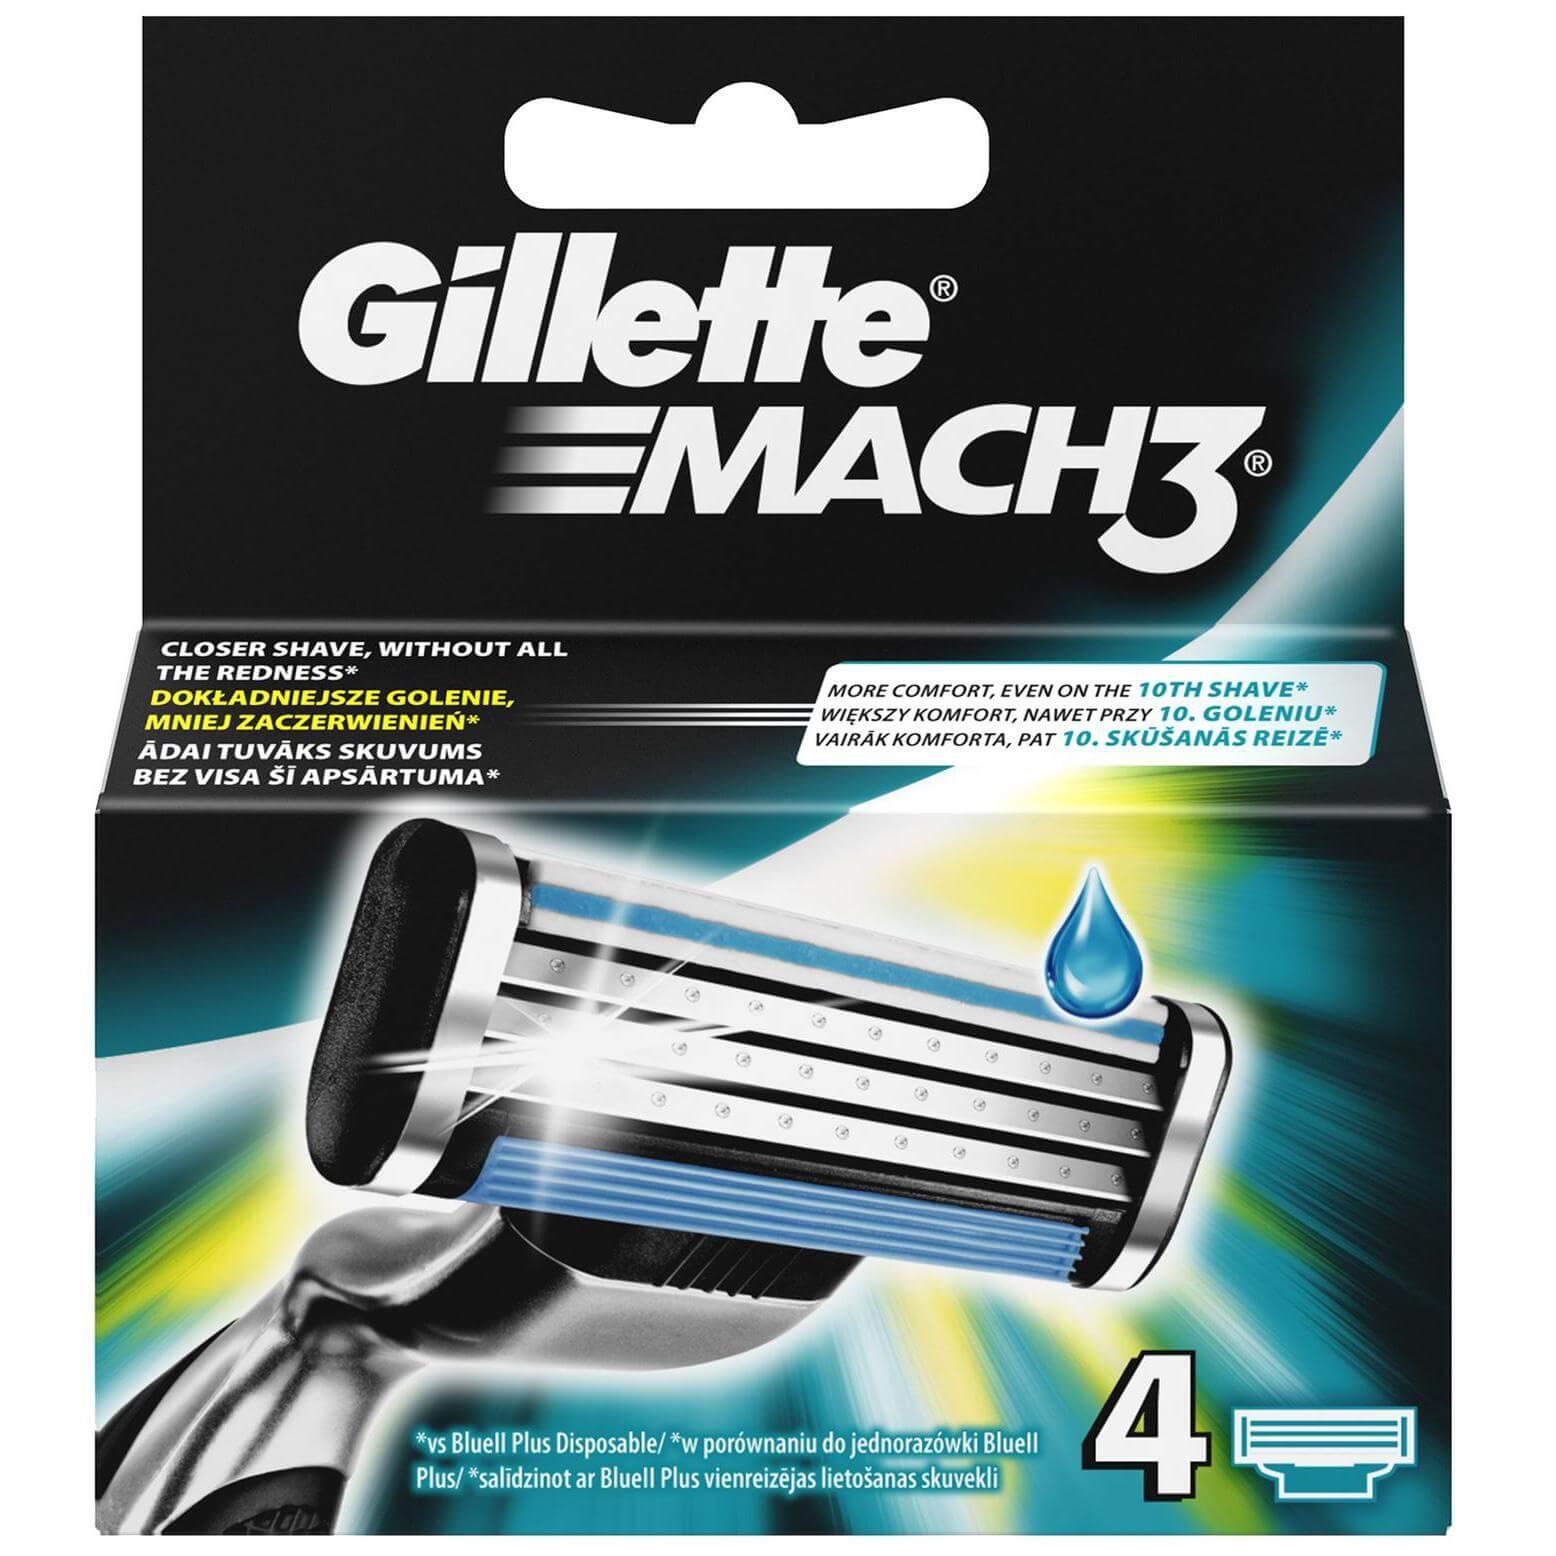 Gillette Mach 3 Ανταλλακτικά για Βαθύτερο Ξύρισμα 4Τμχ